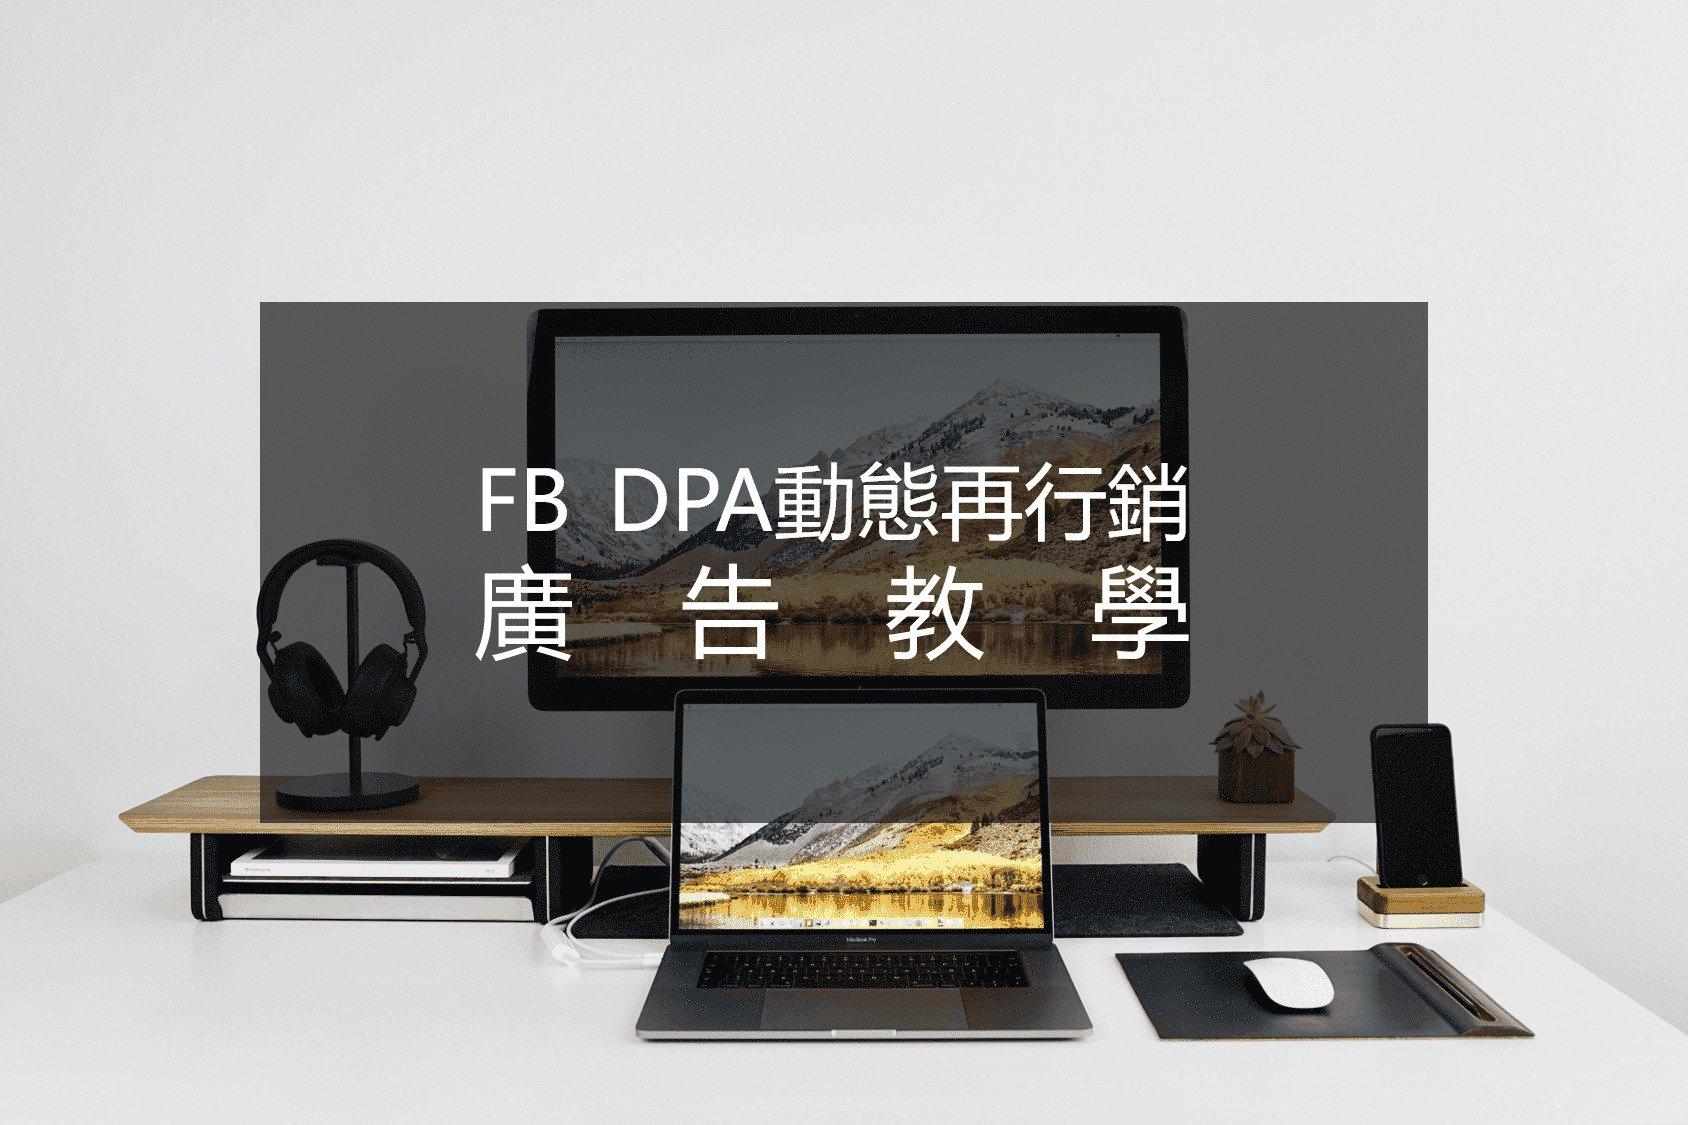 FB DPA動態再行銷廣告教學